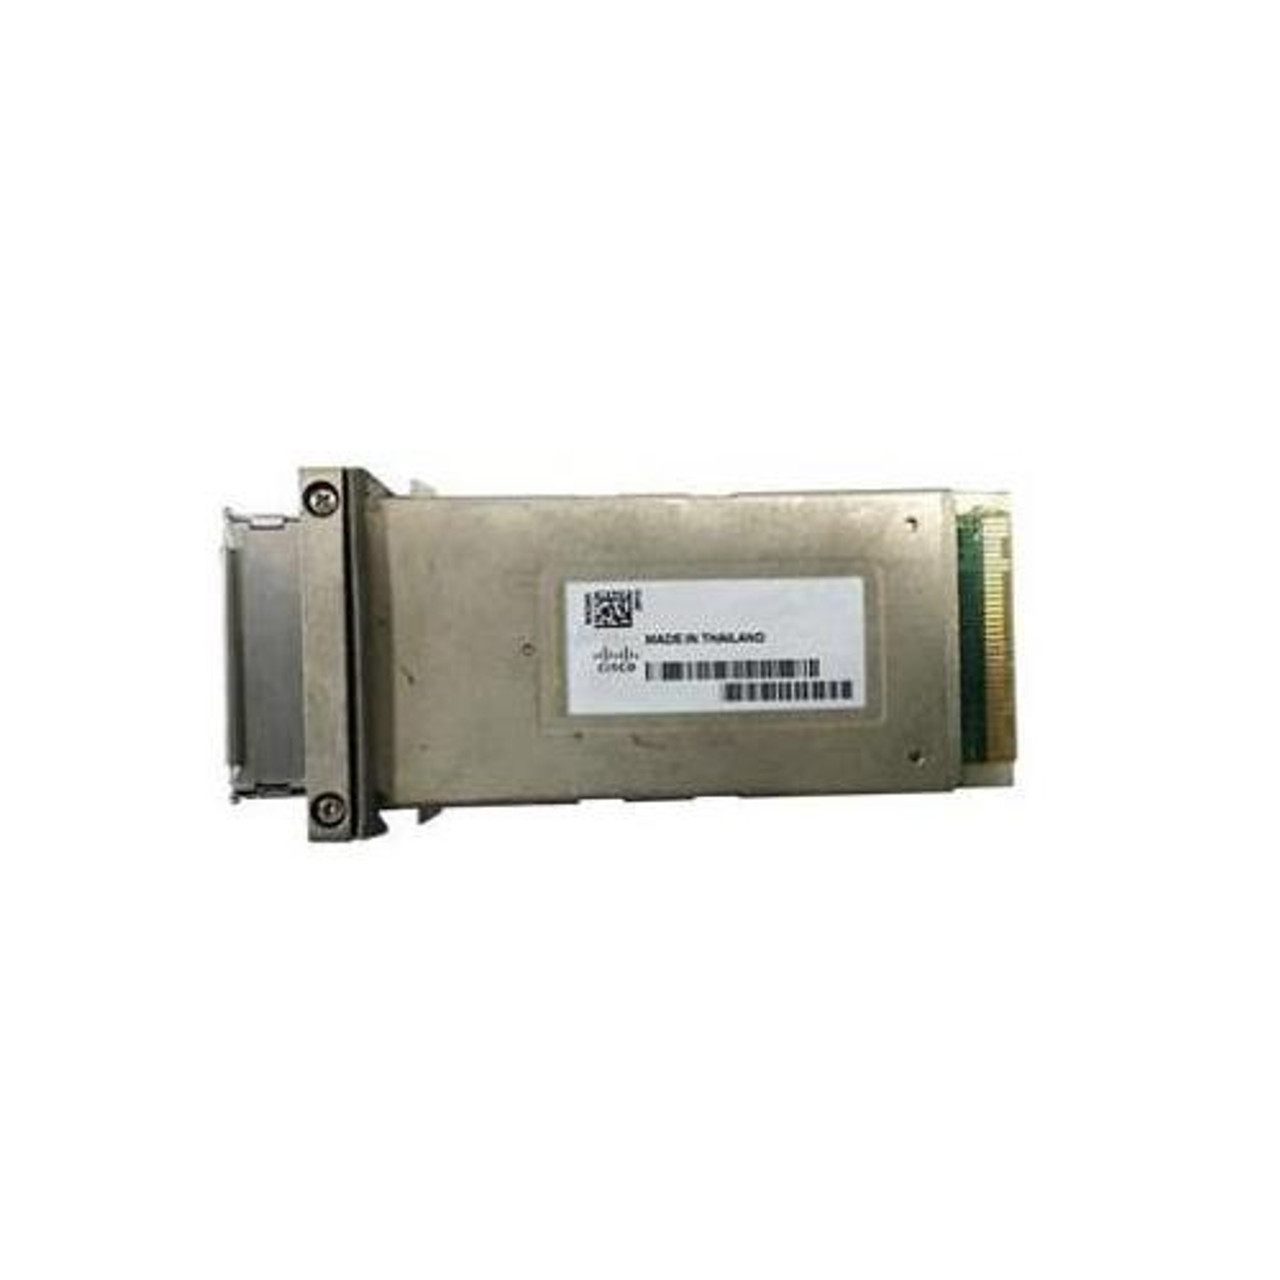 Cisco X2-10GB-LX4 10GBase-LX4 Transceiver Module 10-2154-04  V03